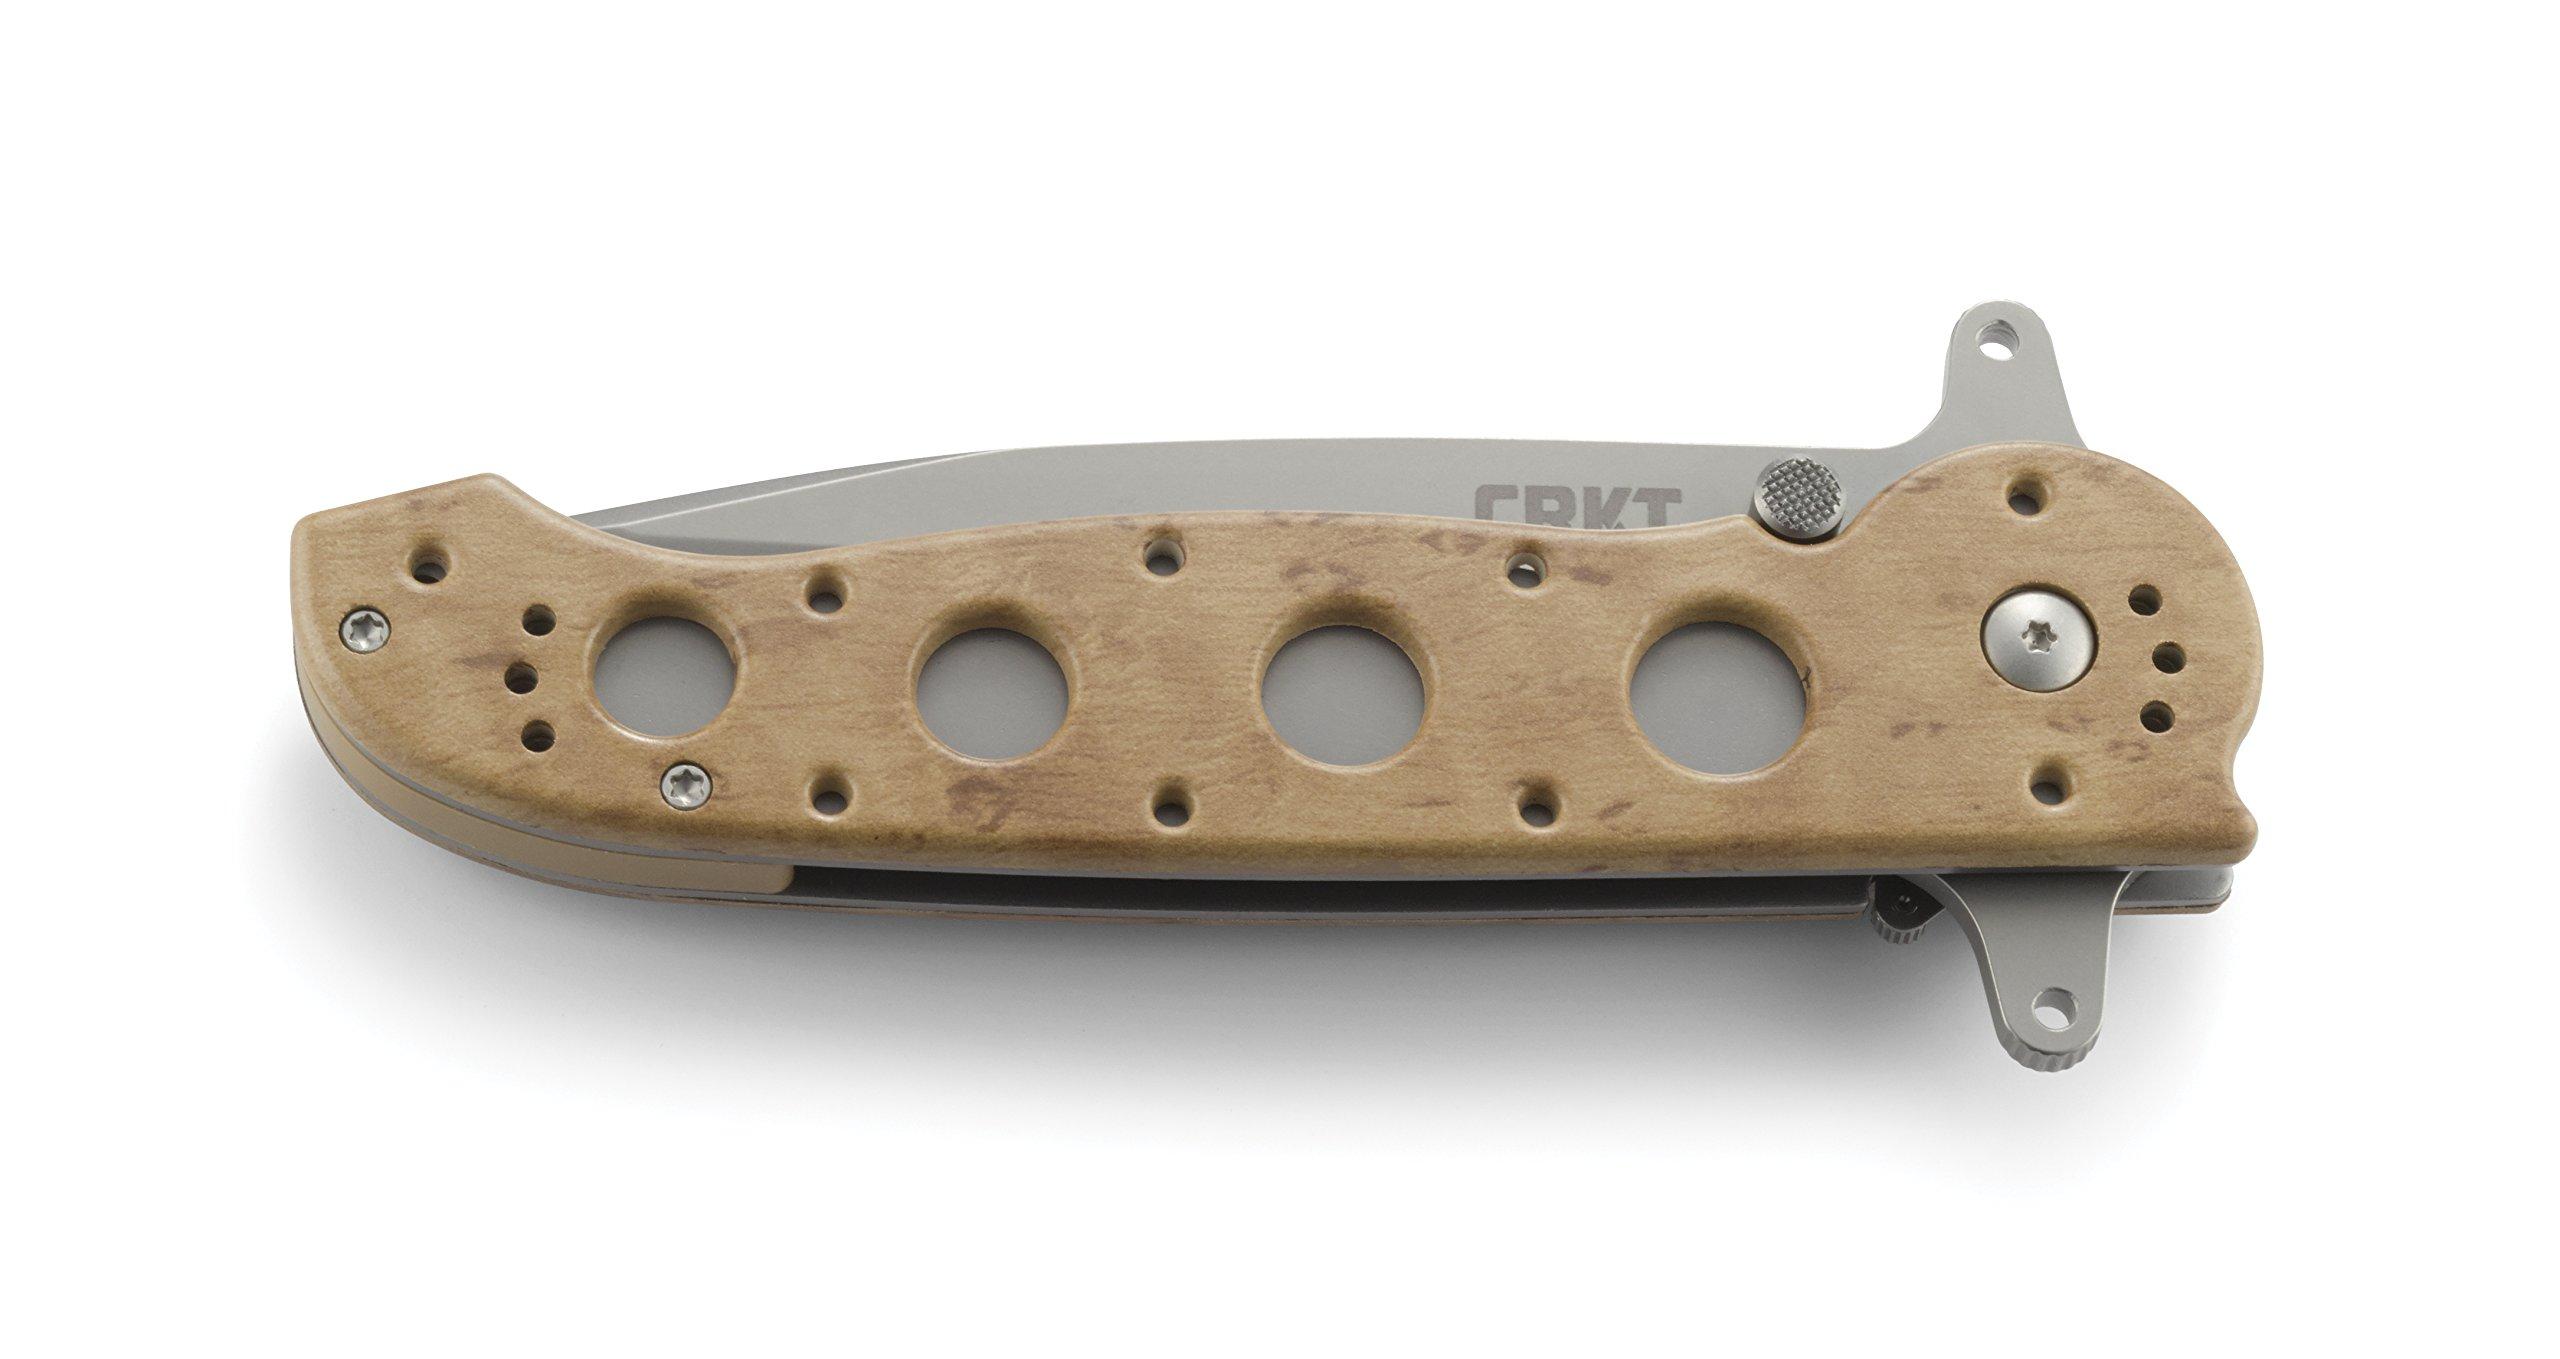 CRKT M16-14ZSF EDC Folding Pocket Knife: Everyday Carry, Serrated Edge Blade, Tanto, Automated Liner Safety, Dual Hilt, Desert Nylon Handle, 4-Position Pocket Clip